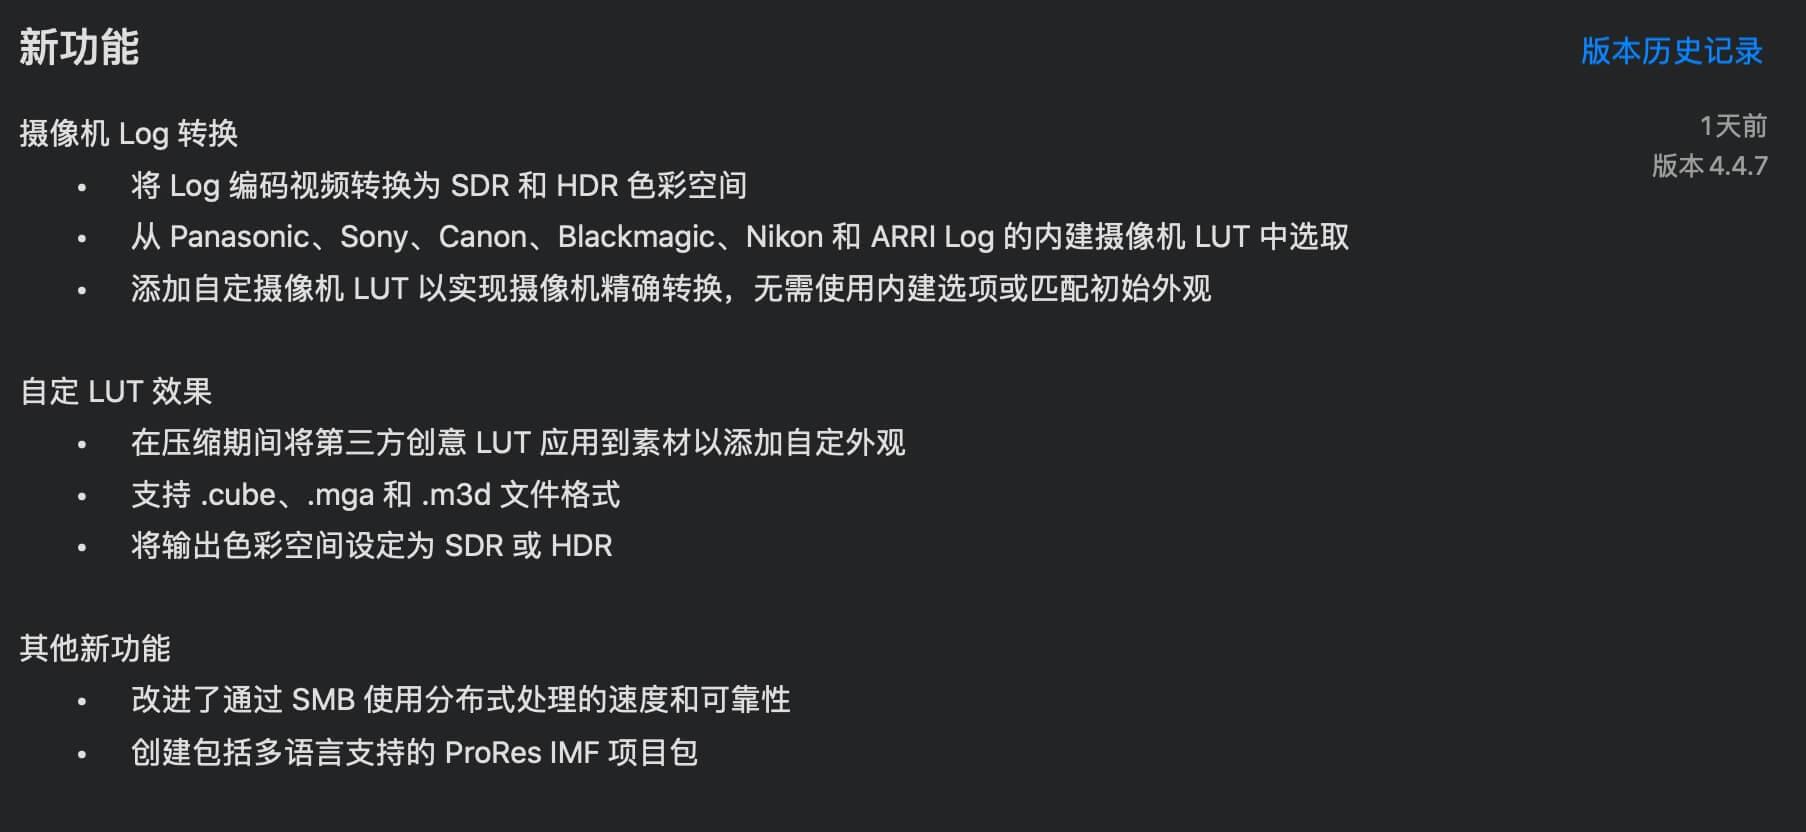 Apple Compressor 4.4.7 免费下载 中英文版 苹果视频压缩编码转码输出软件